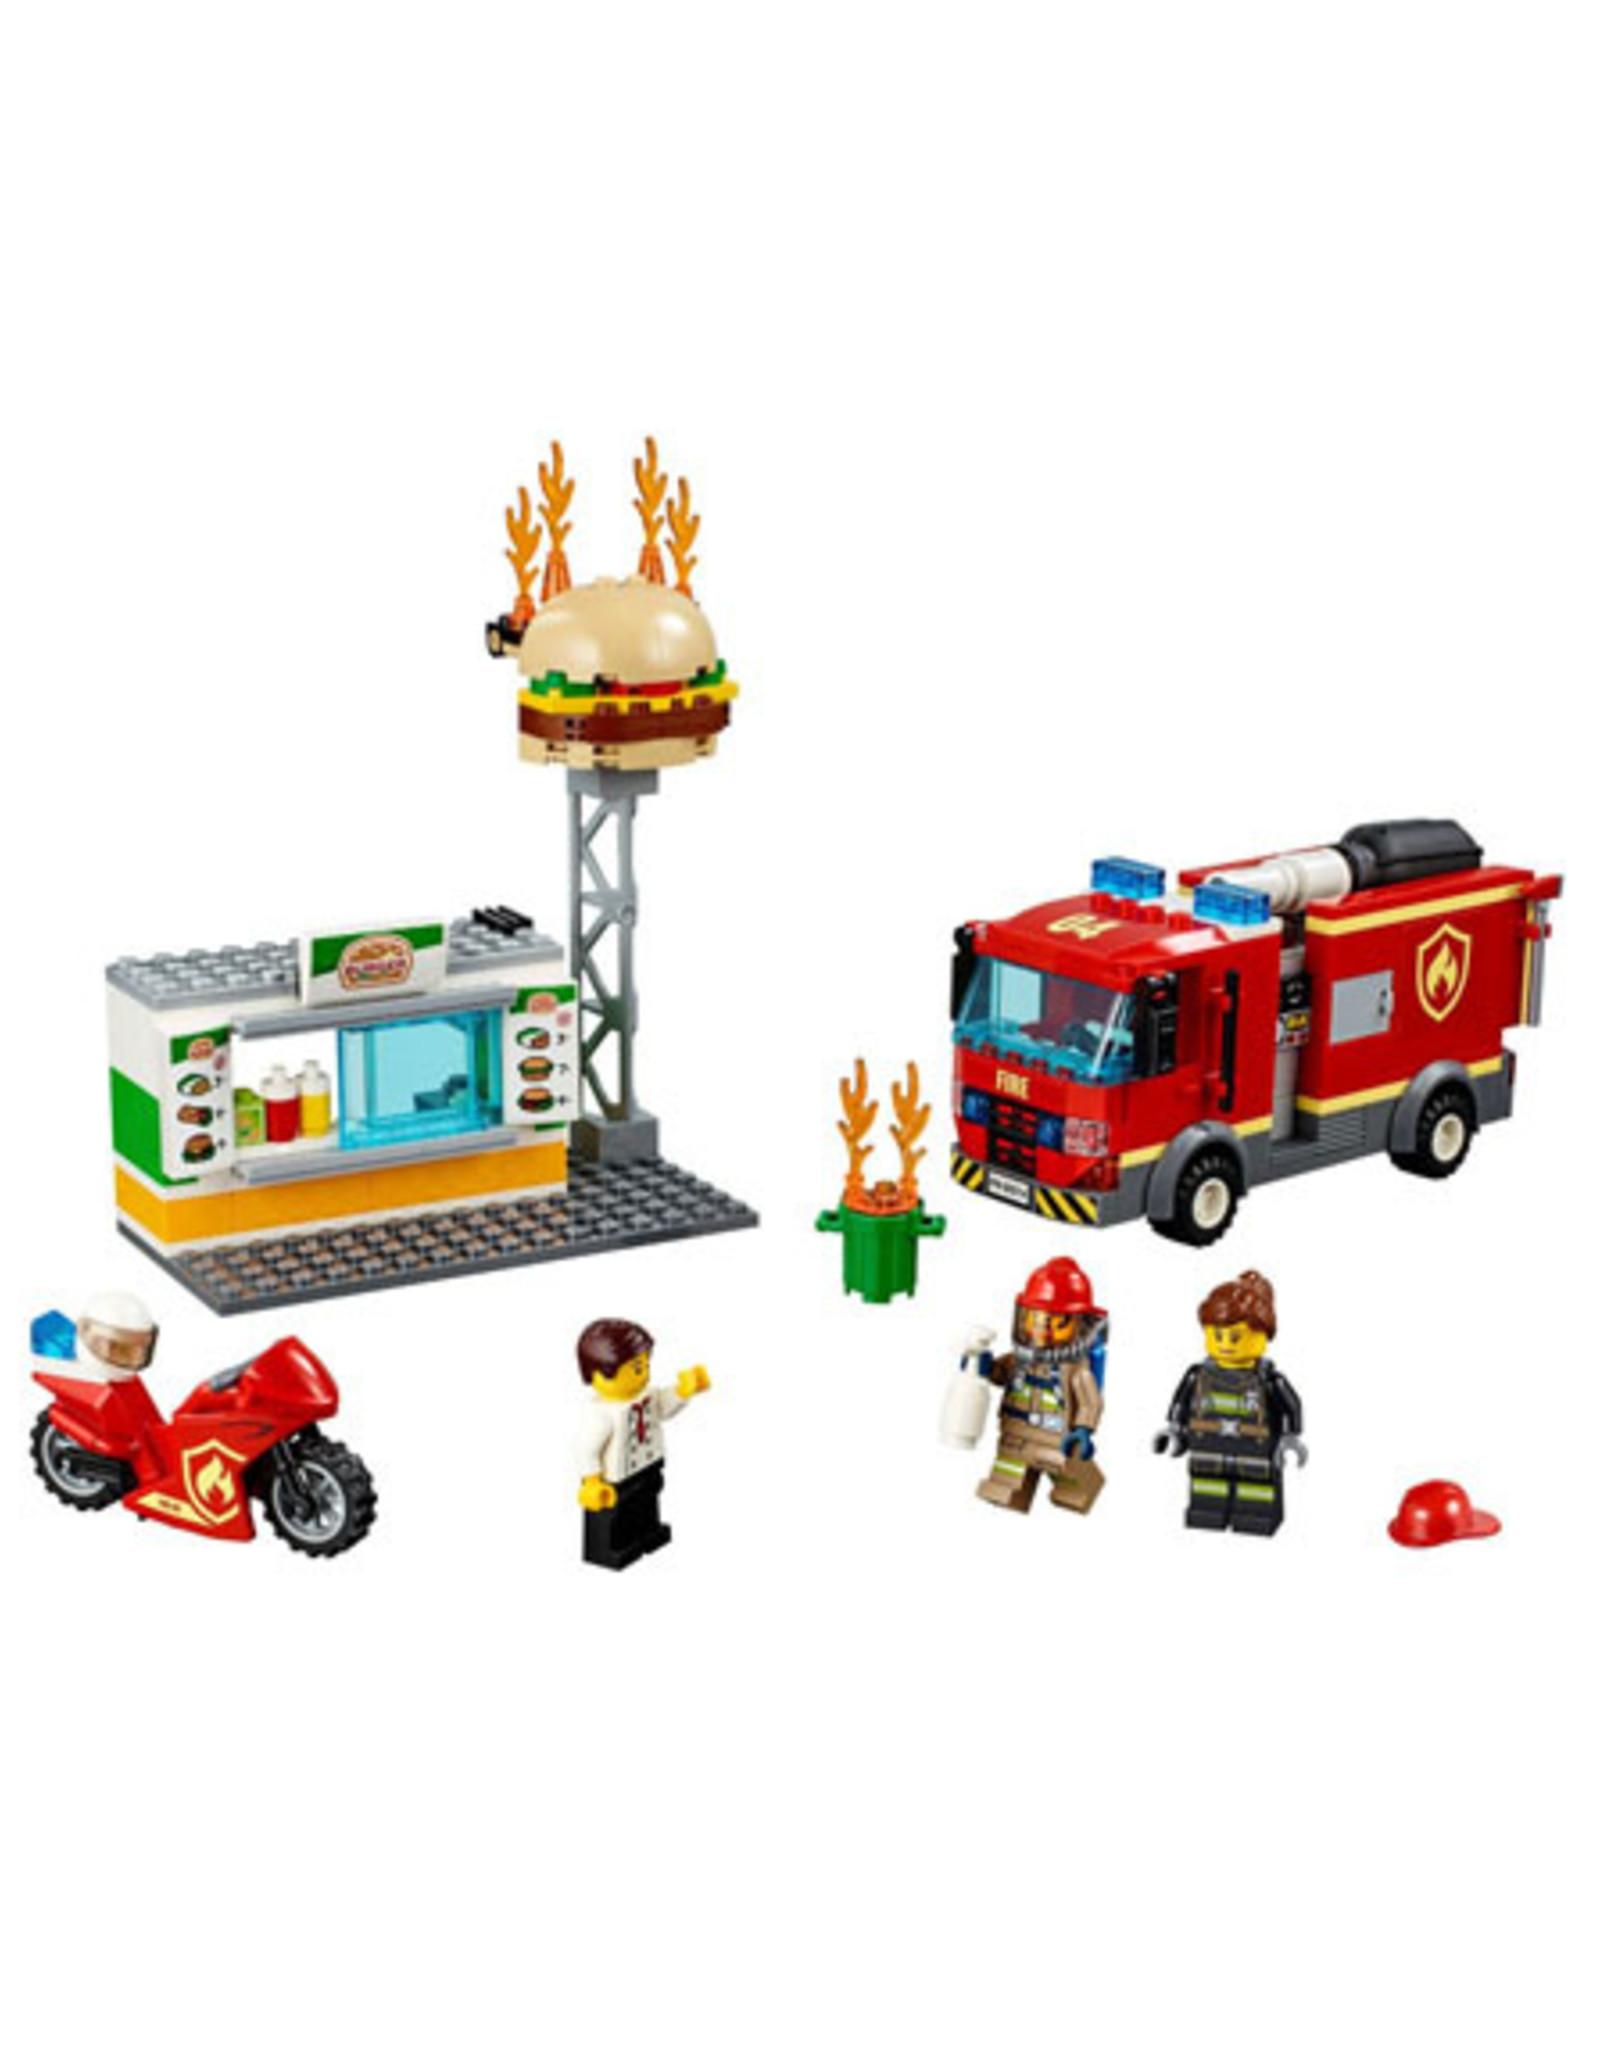 LEGO LEGO 60214 Burger Bar Fire Rescue CITY